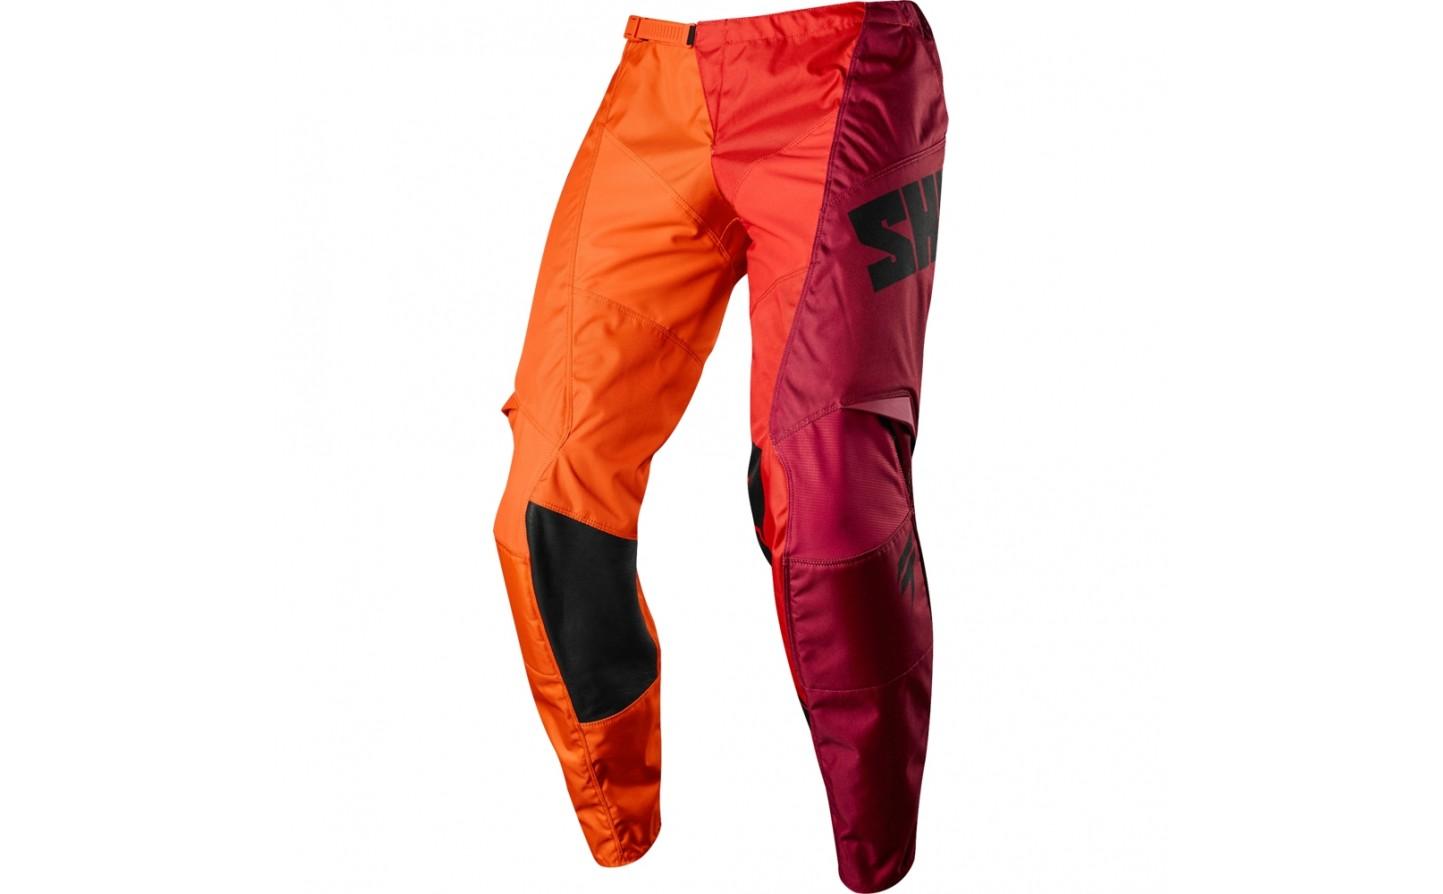 pantalon shift label whit3 tarmac naranja talle 36